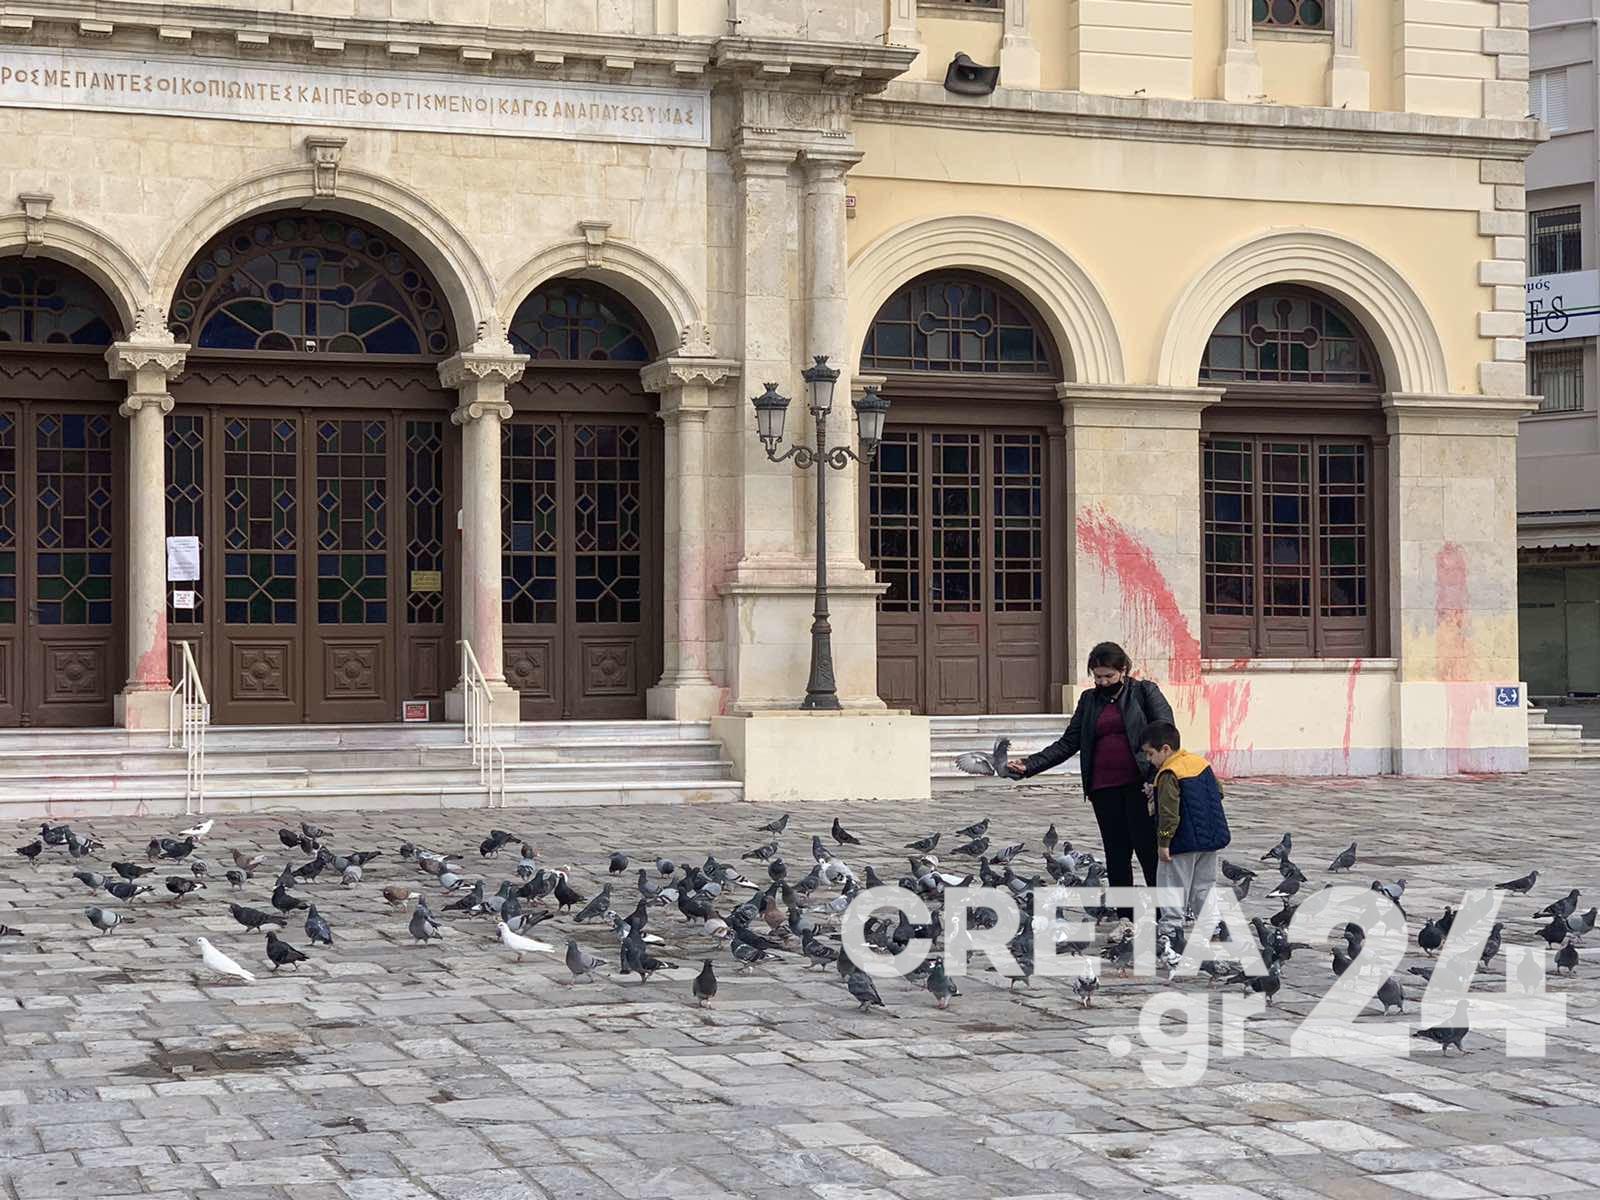 Metropolitan Church of Agios Minas in Heraklion vandalized by unknown people 2